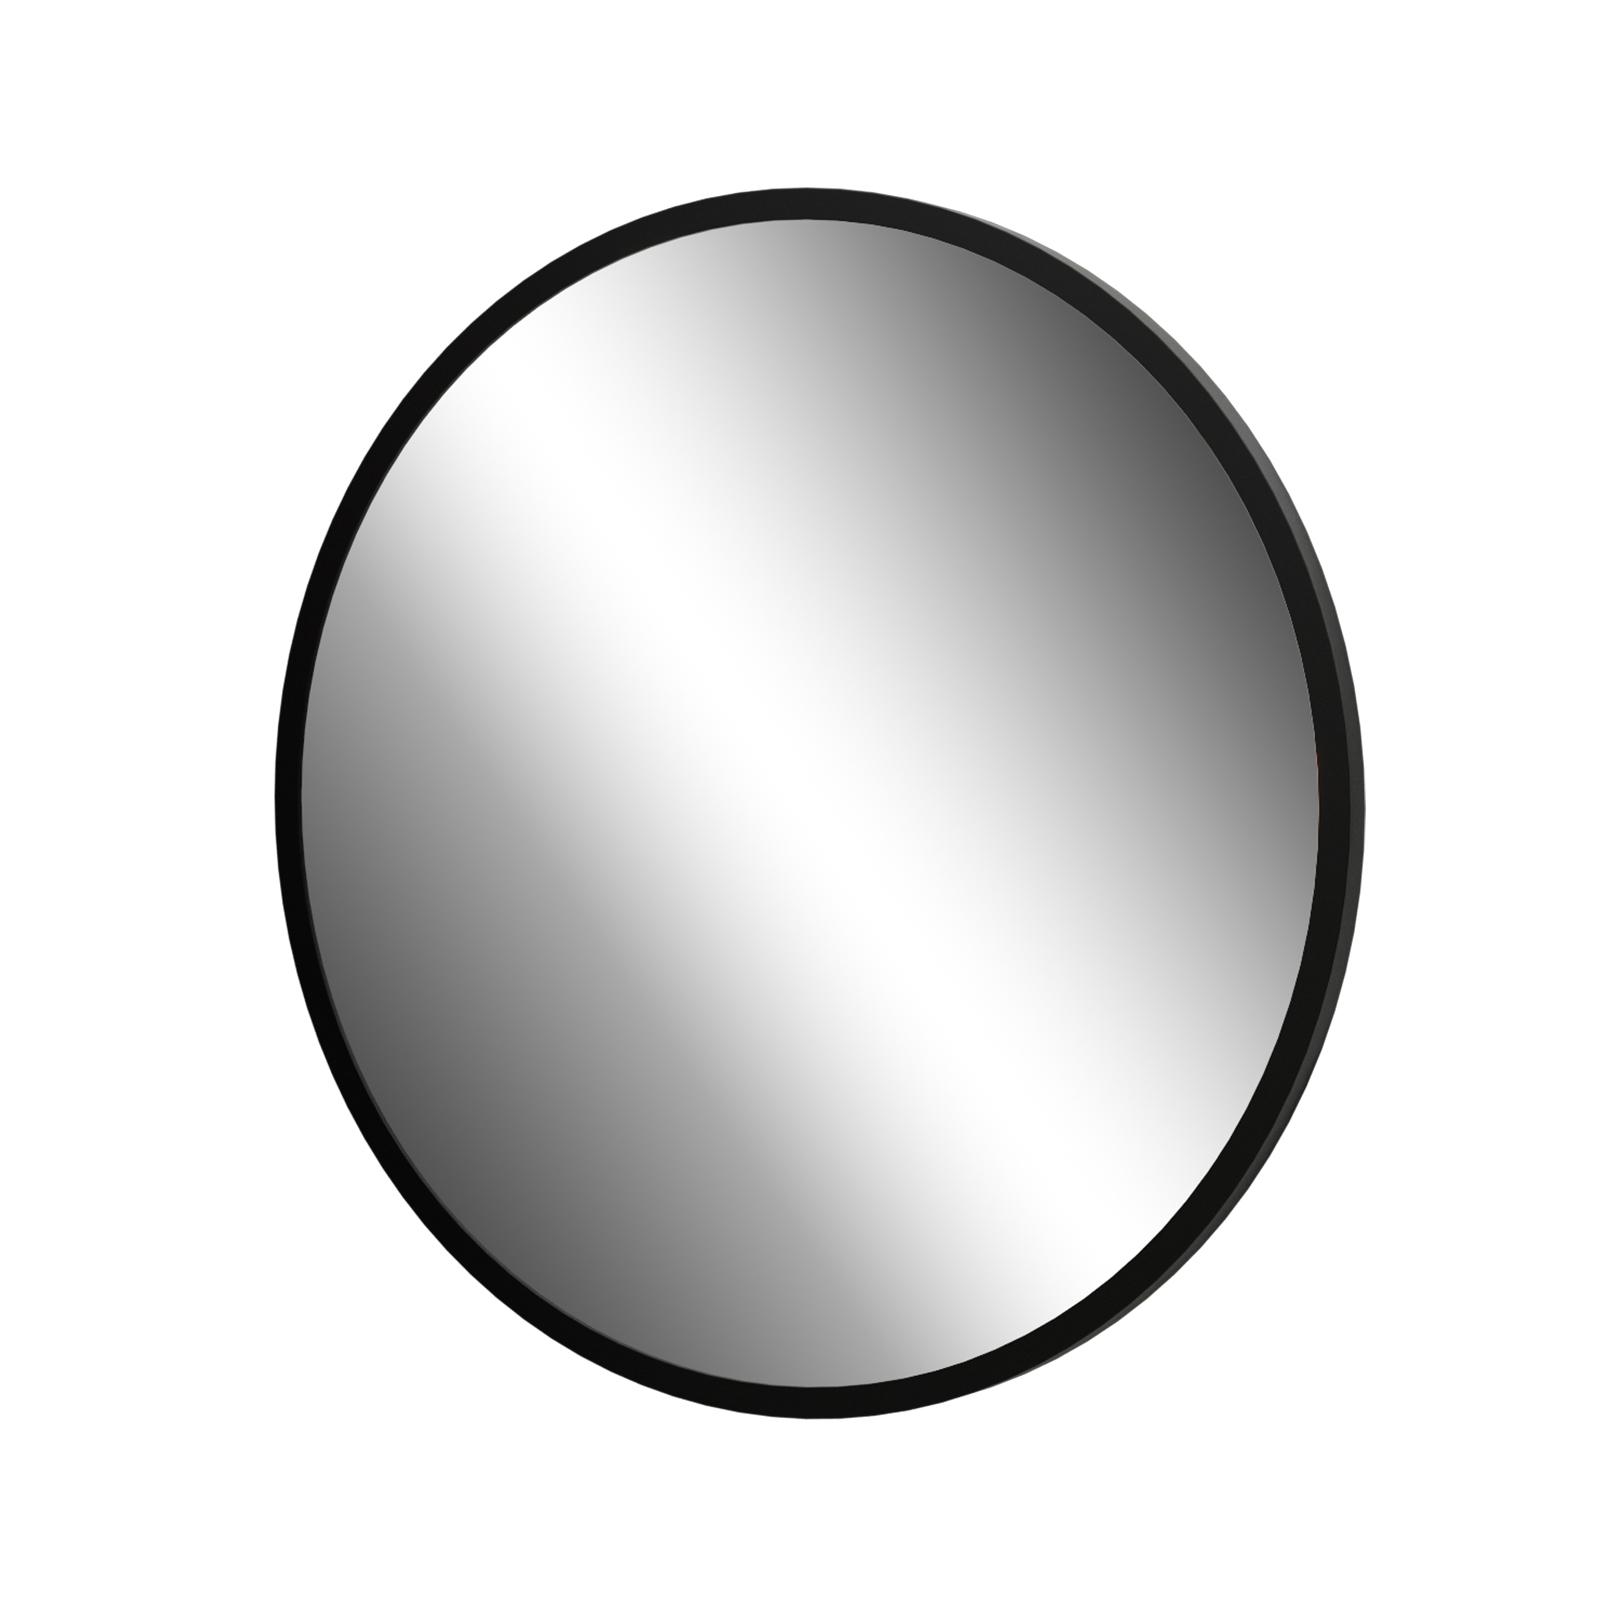 Living Elements 800 x 20mm Black Framed Round Mirror